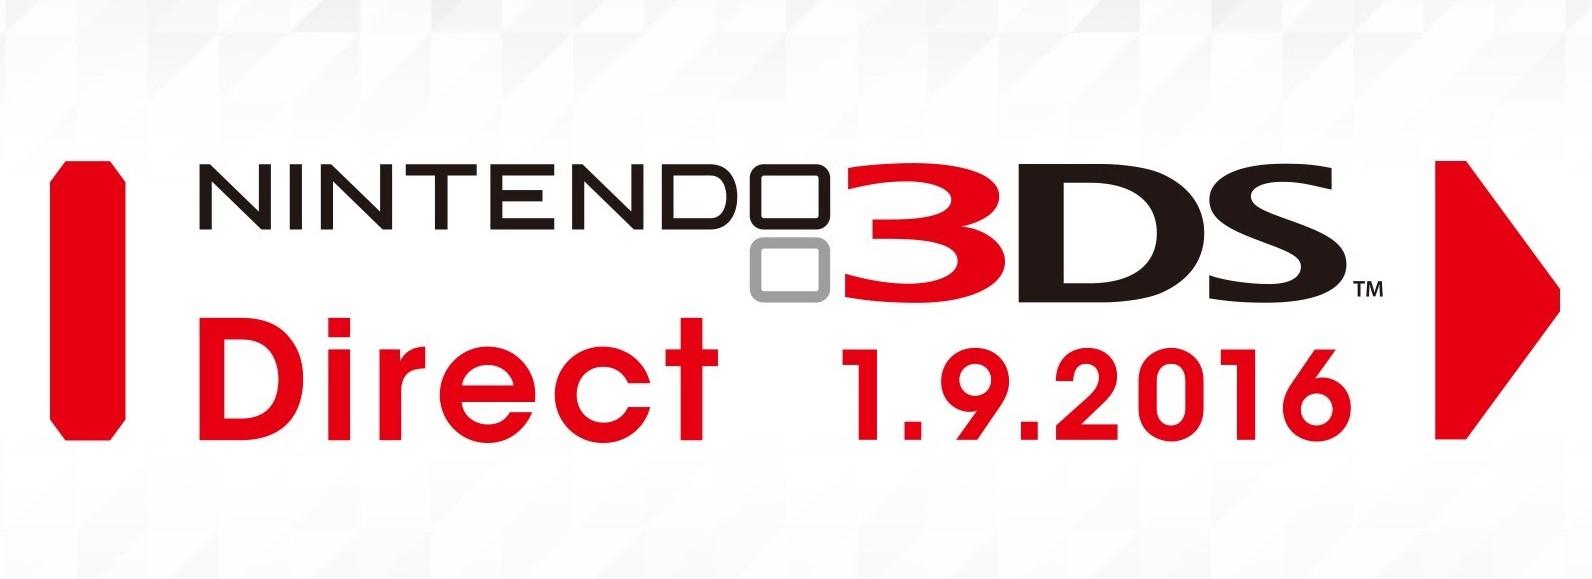 Nintendo Direct Sept 1